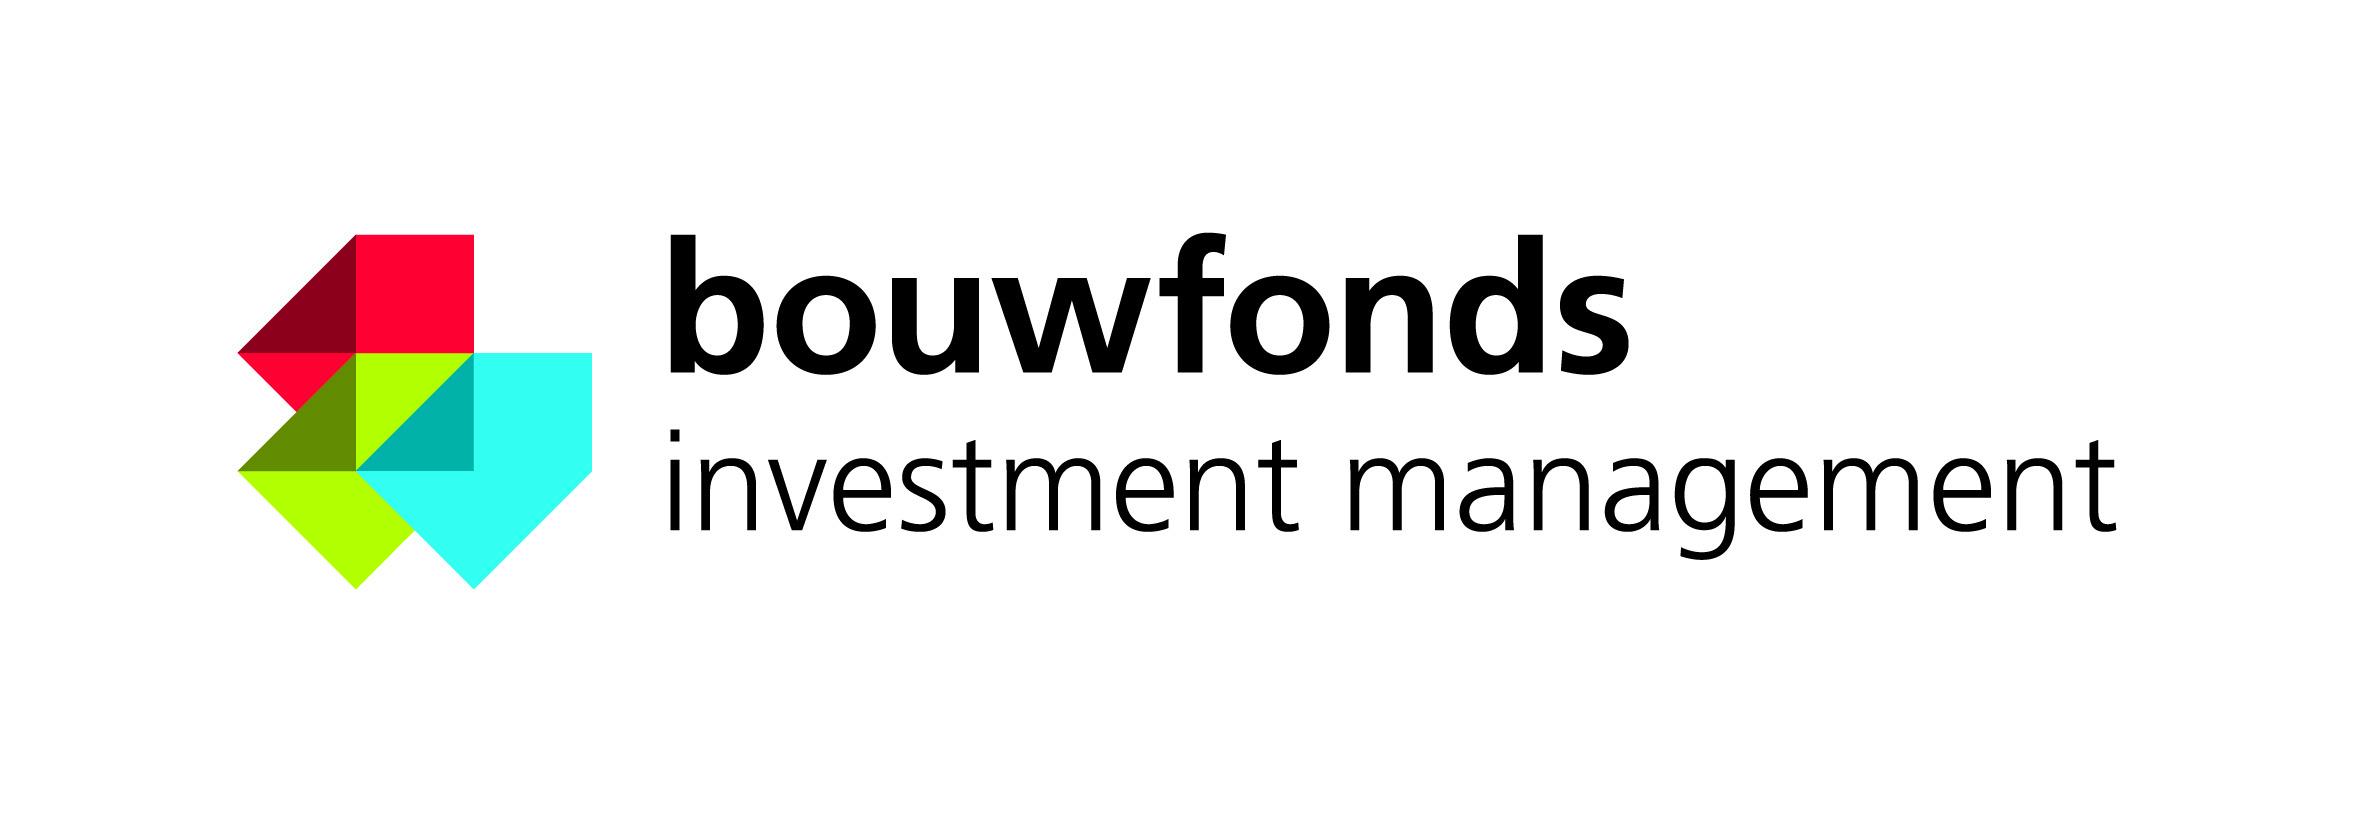 Bouwinvest bouwfonds investment bt investment management asx actionpro-x